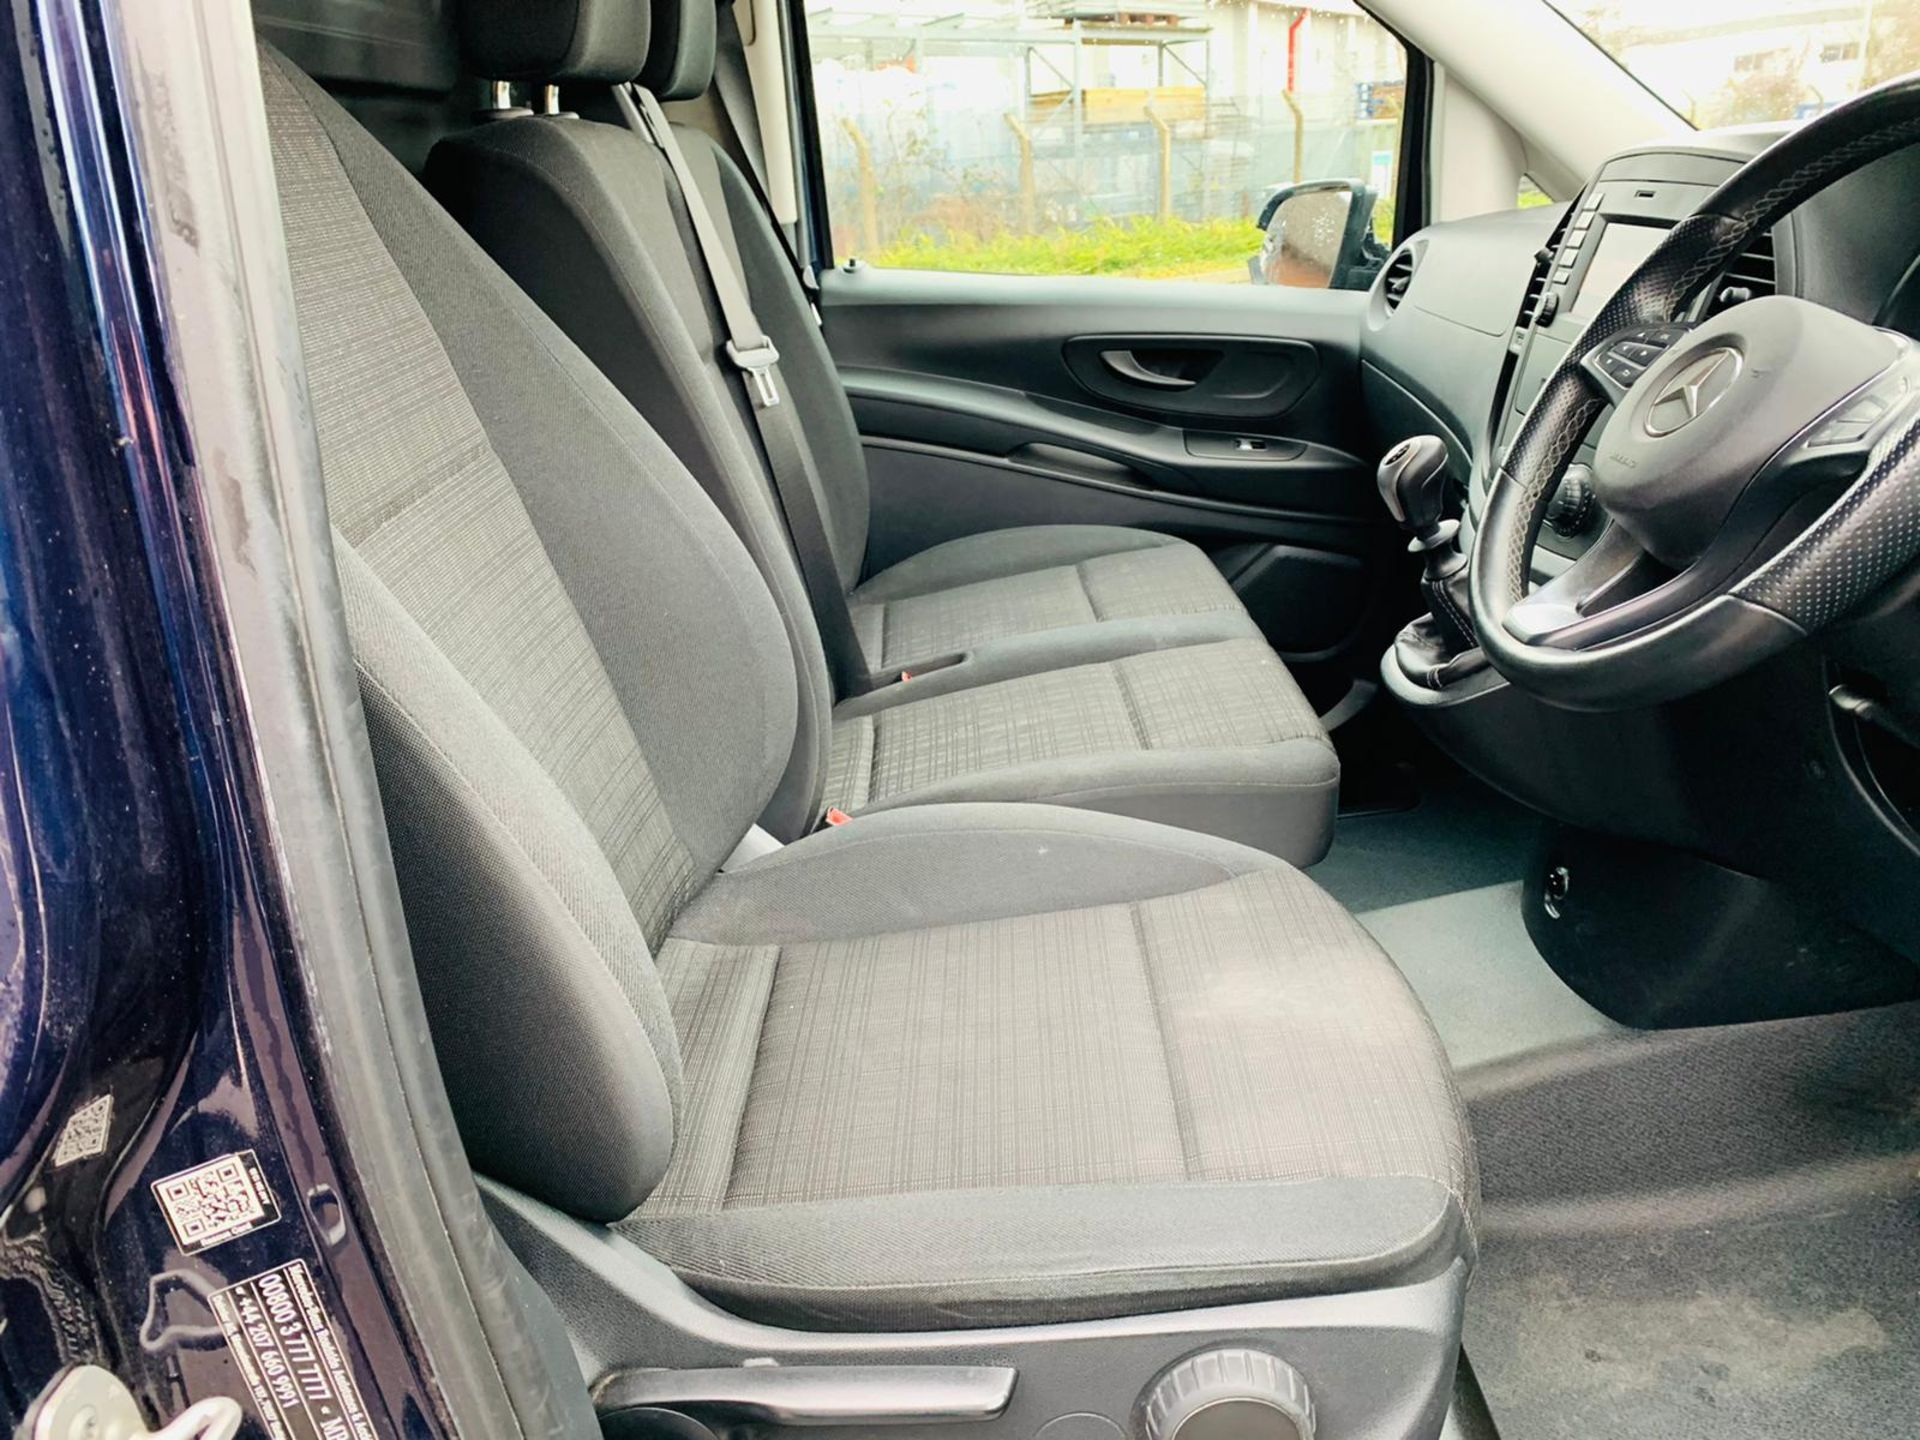 (RESERVE MET) Mercedes Vito 116Cdi Sporty Spec (161 BHP) Bluetech 6 Speed Van - 2016 Model - AC - Image 16 of 28